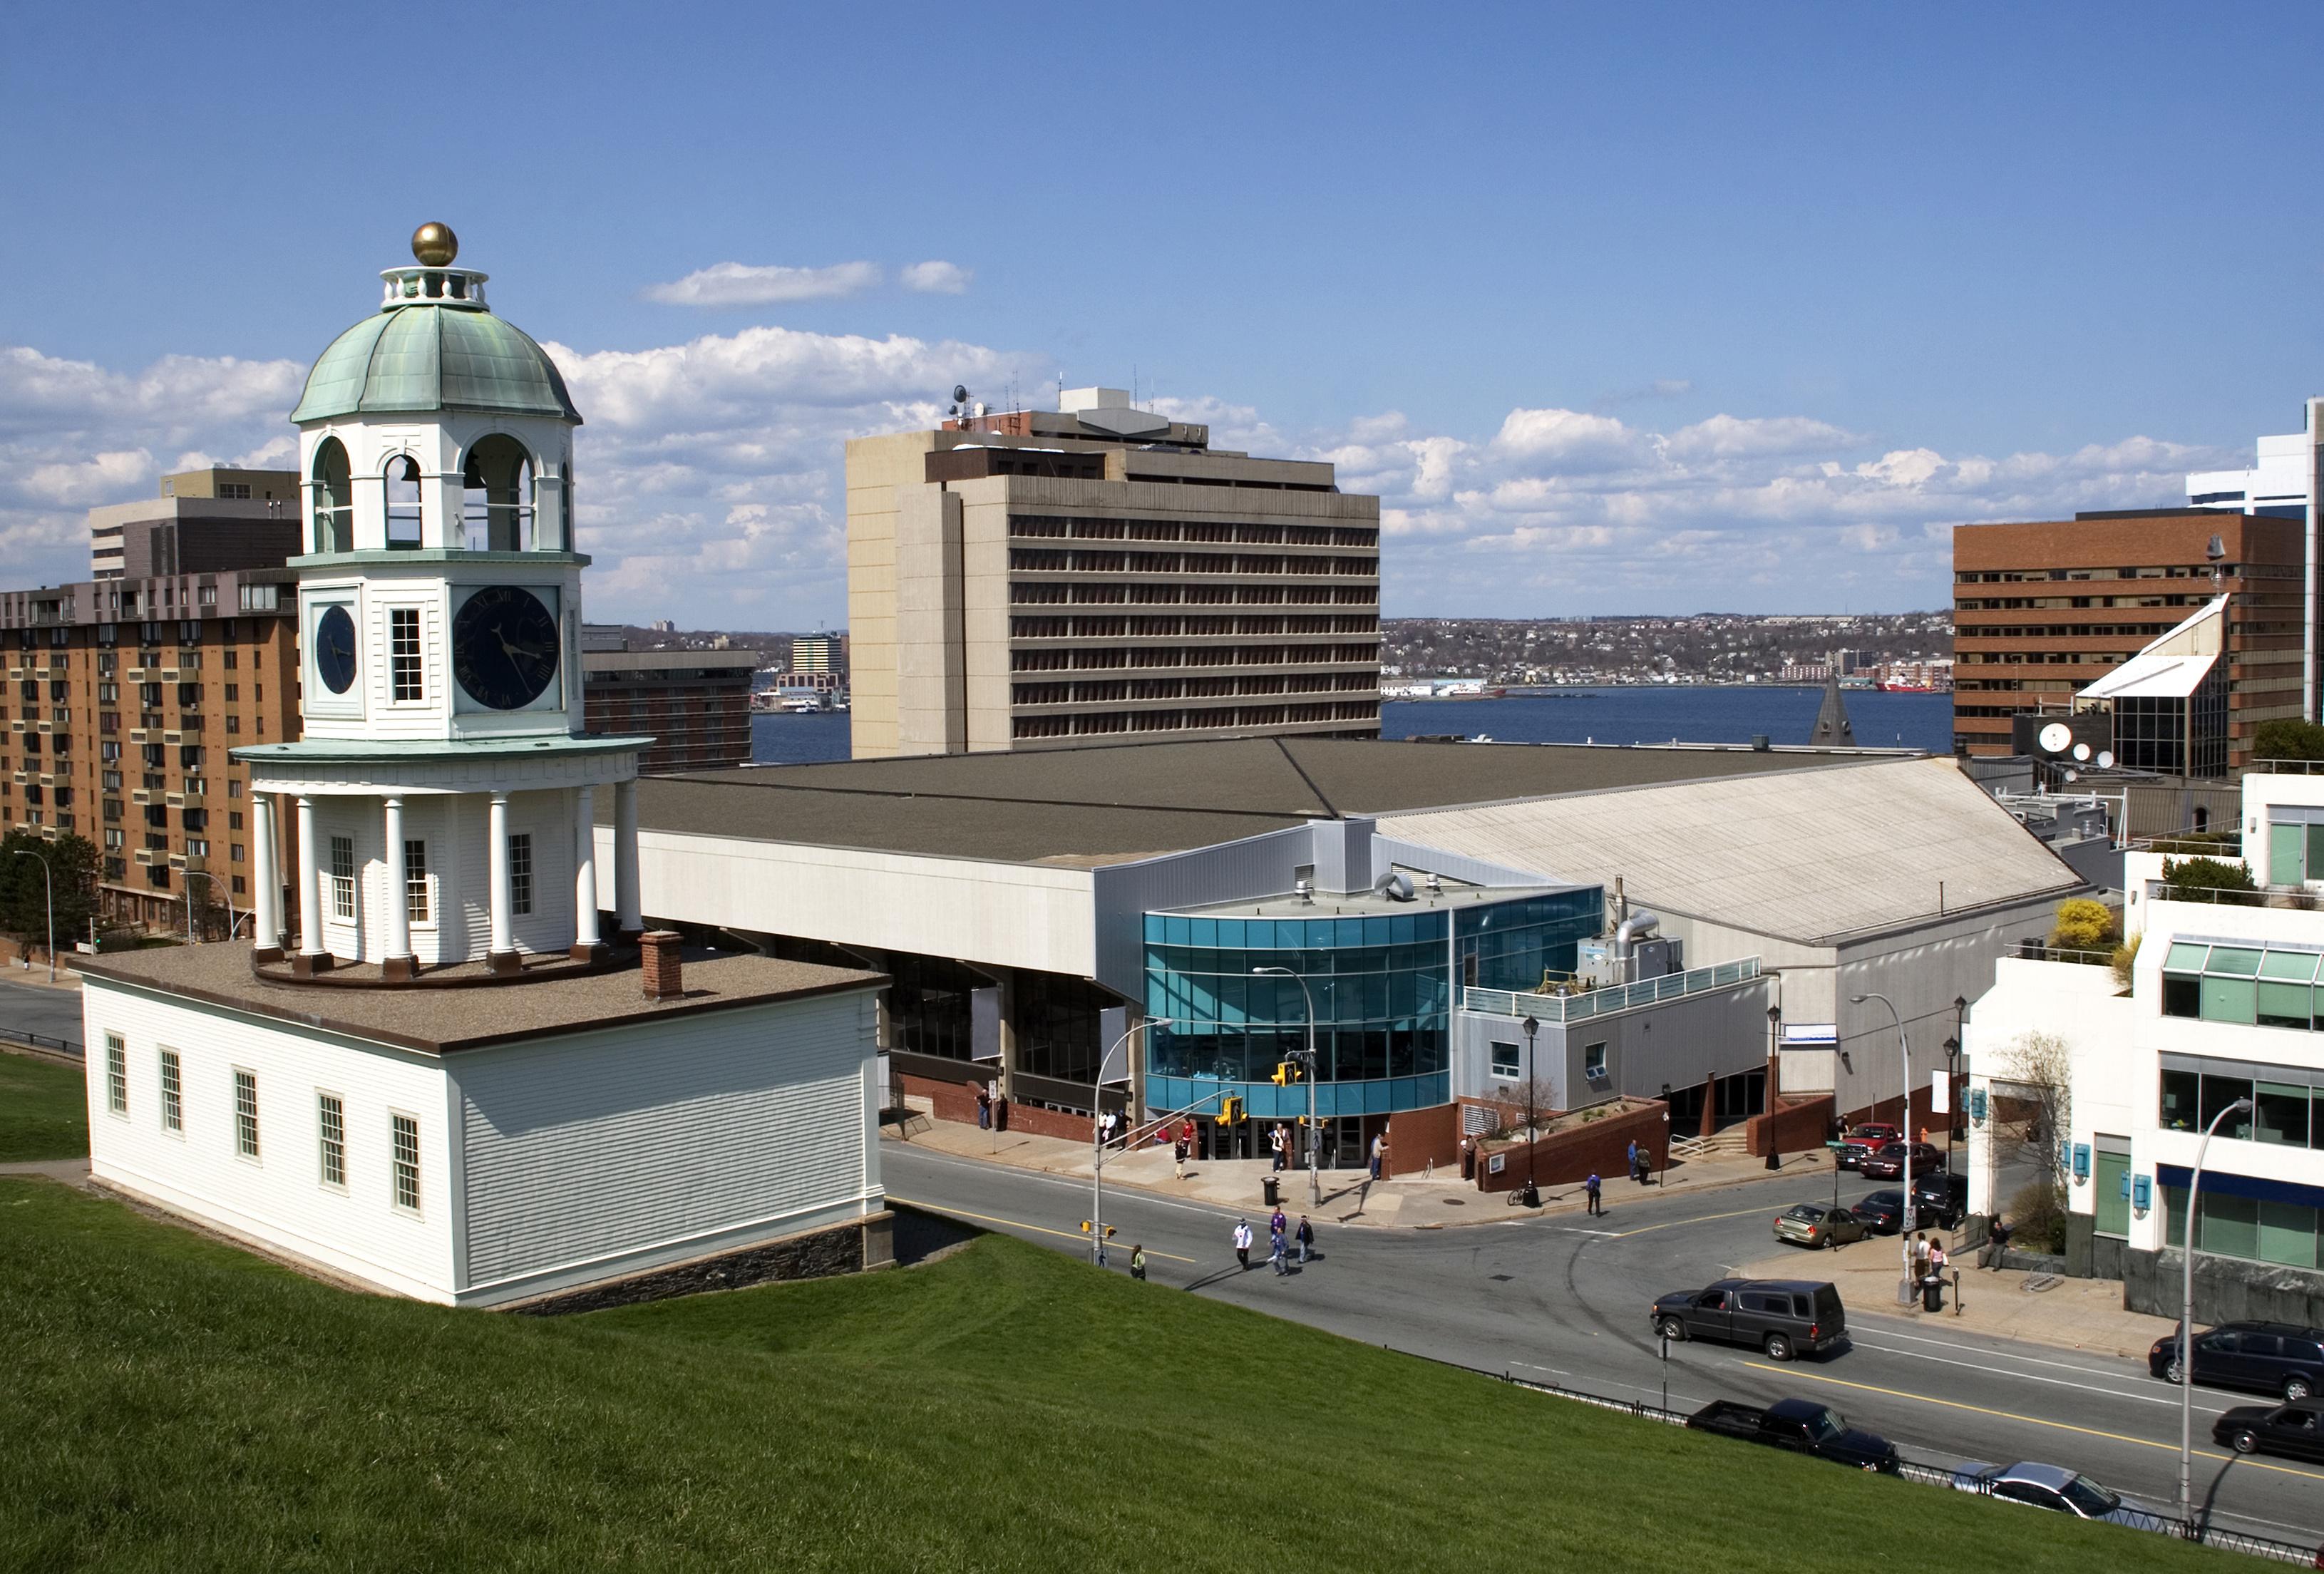 Halifax Citadel Clock Tower